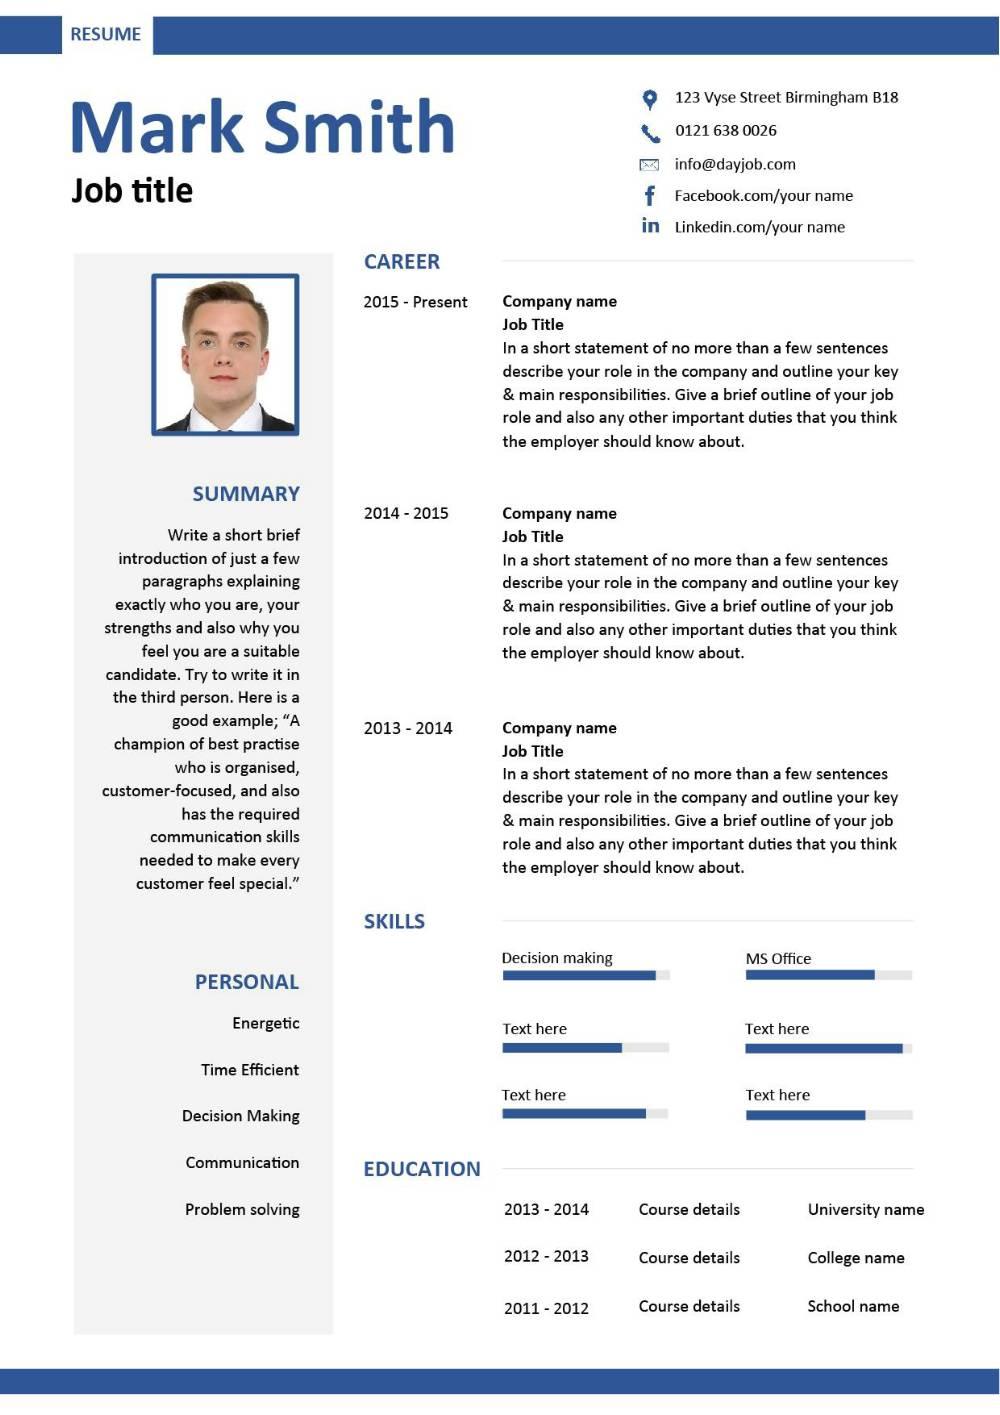 HR manager CV template - Avari Point